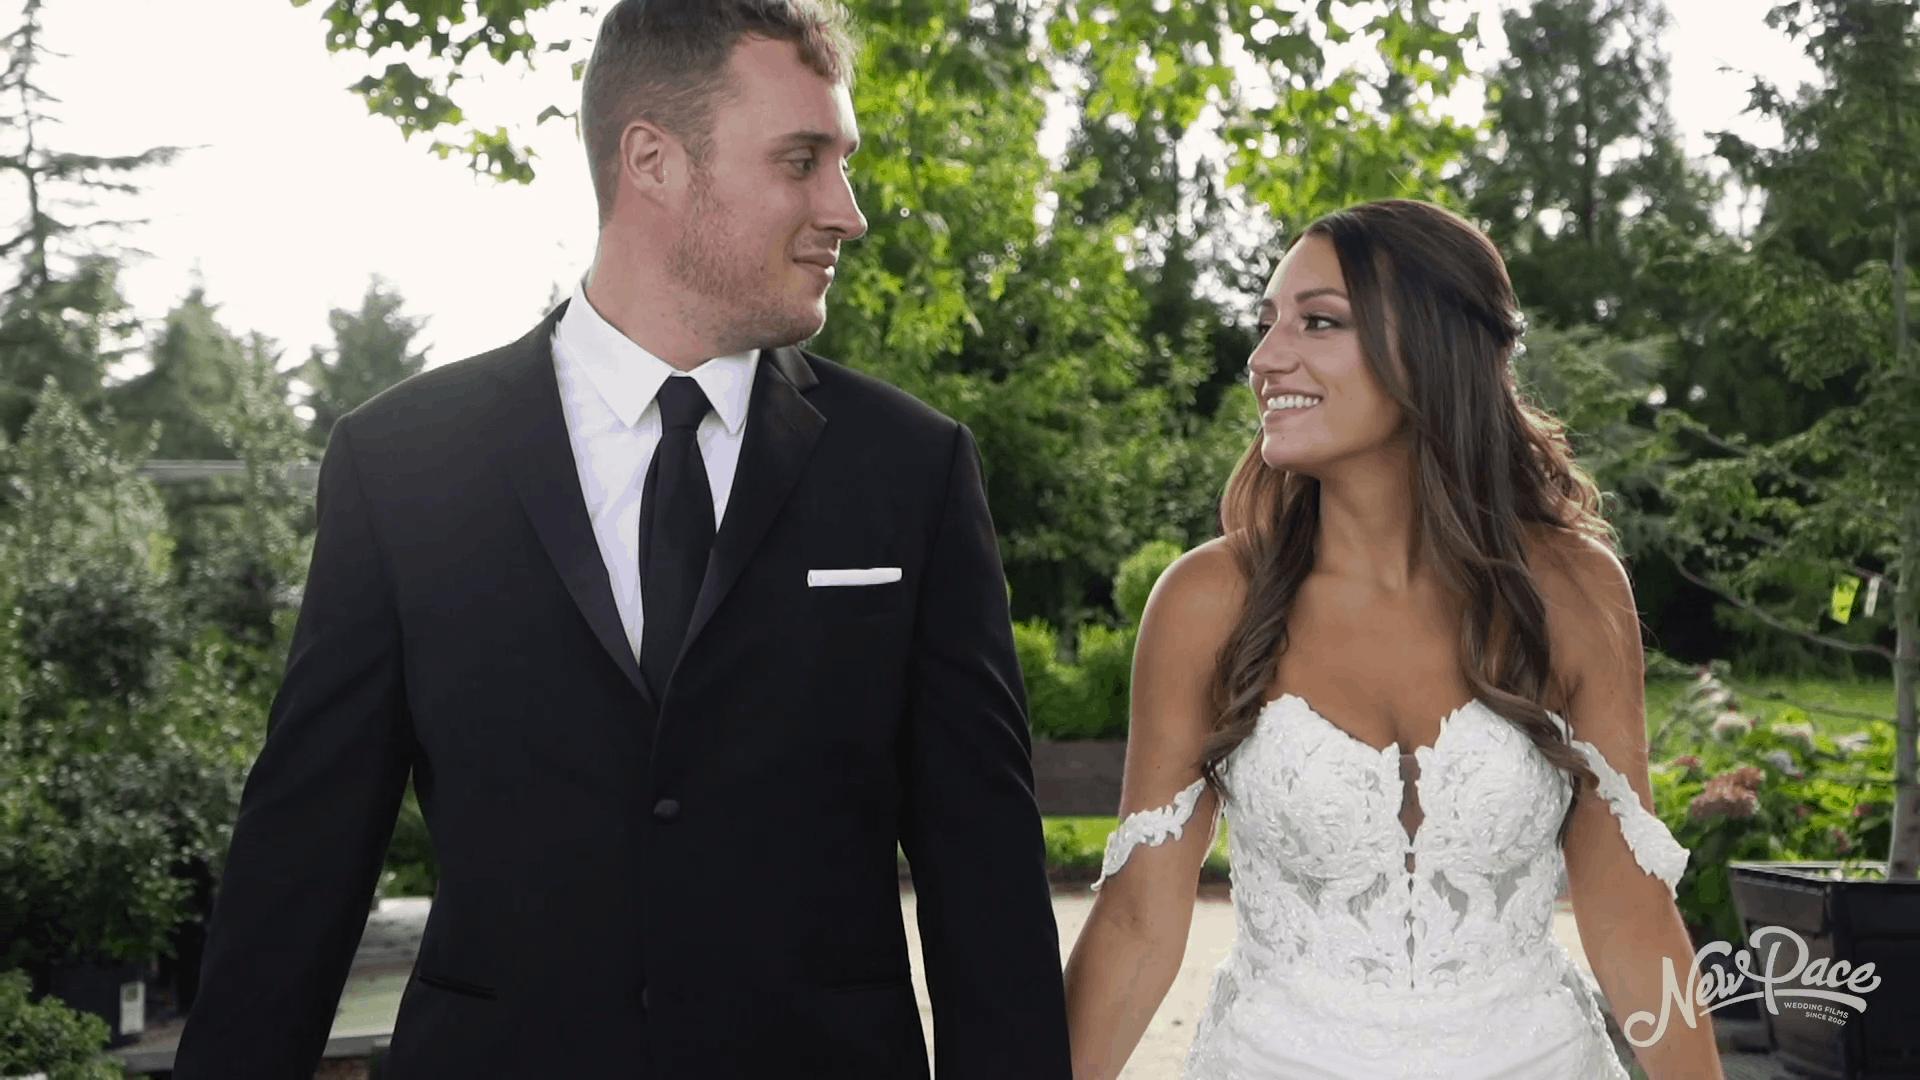 Brittany & Sean – Terrain At Styer's